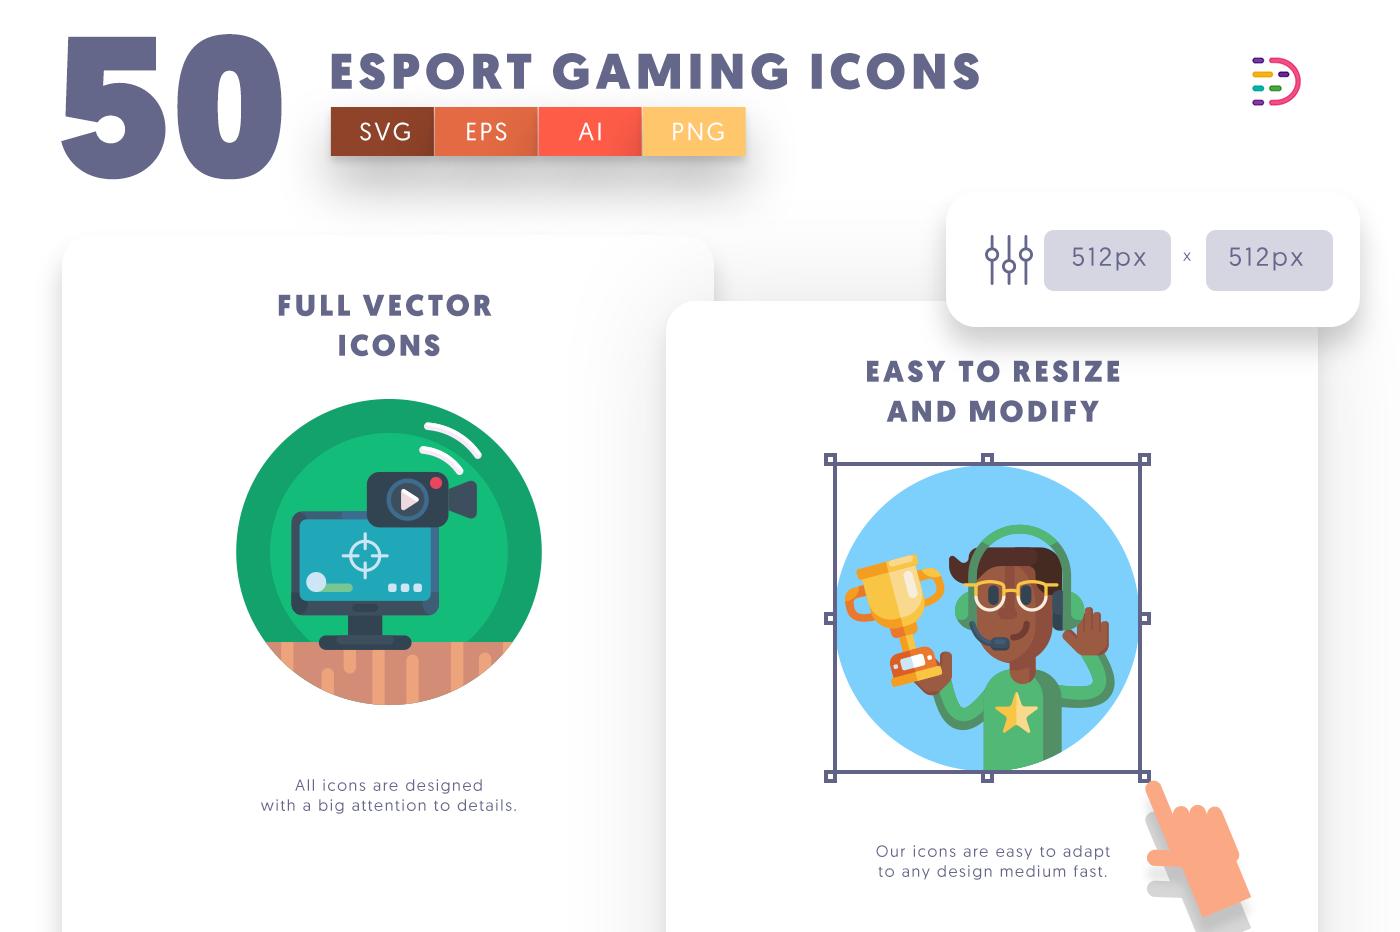 Full vector 50EsportGaming Icons